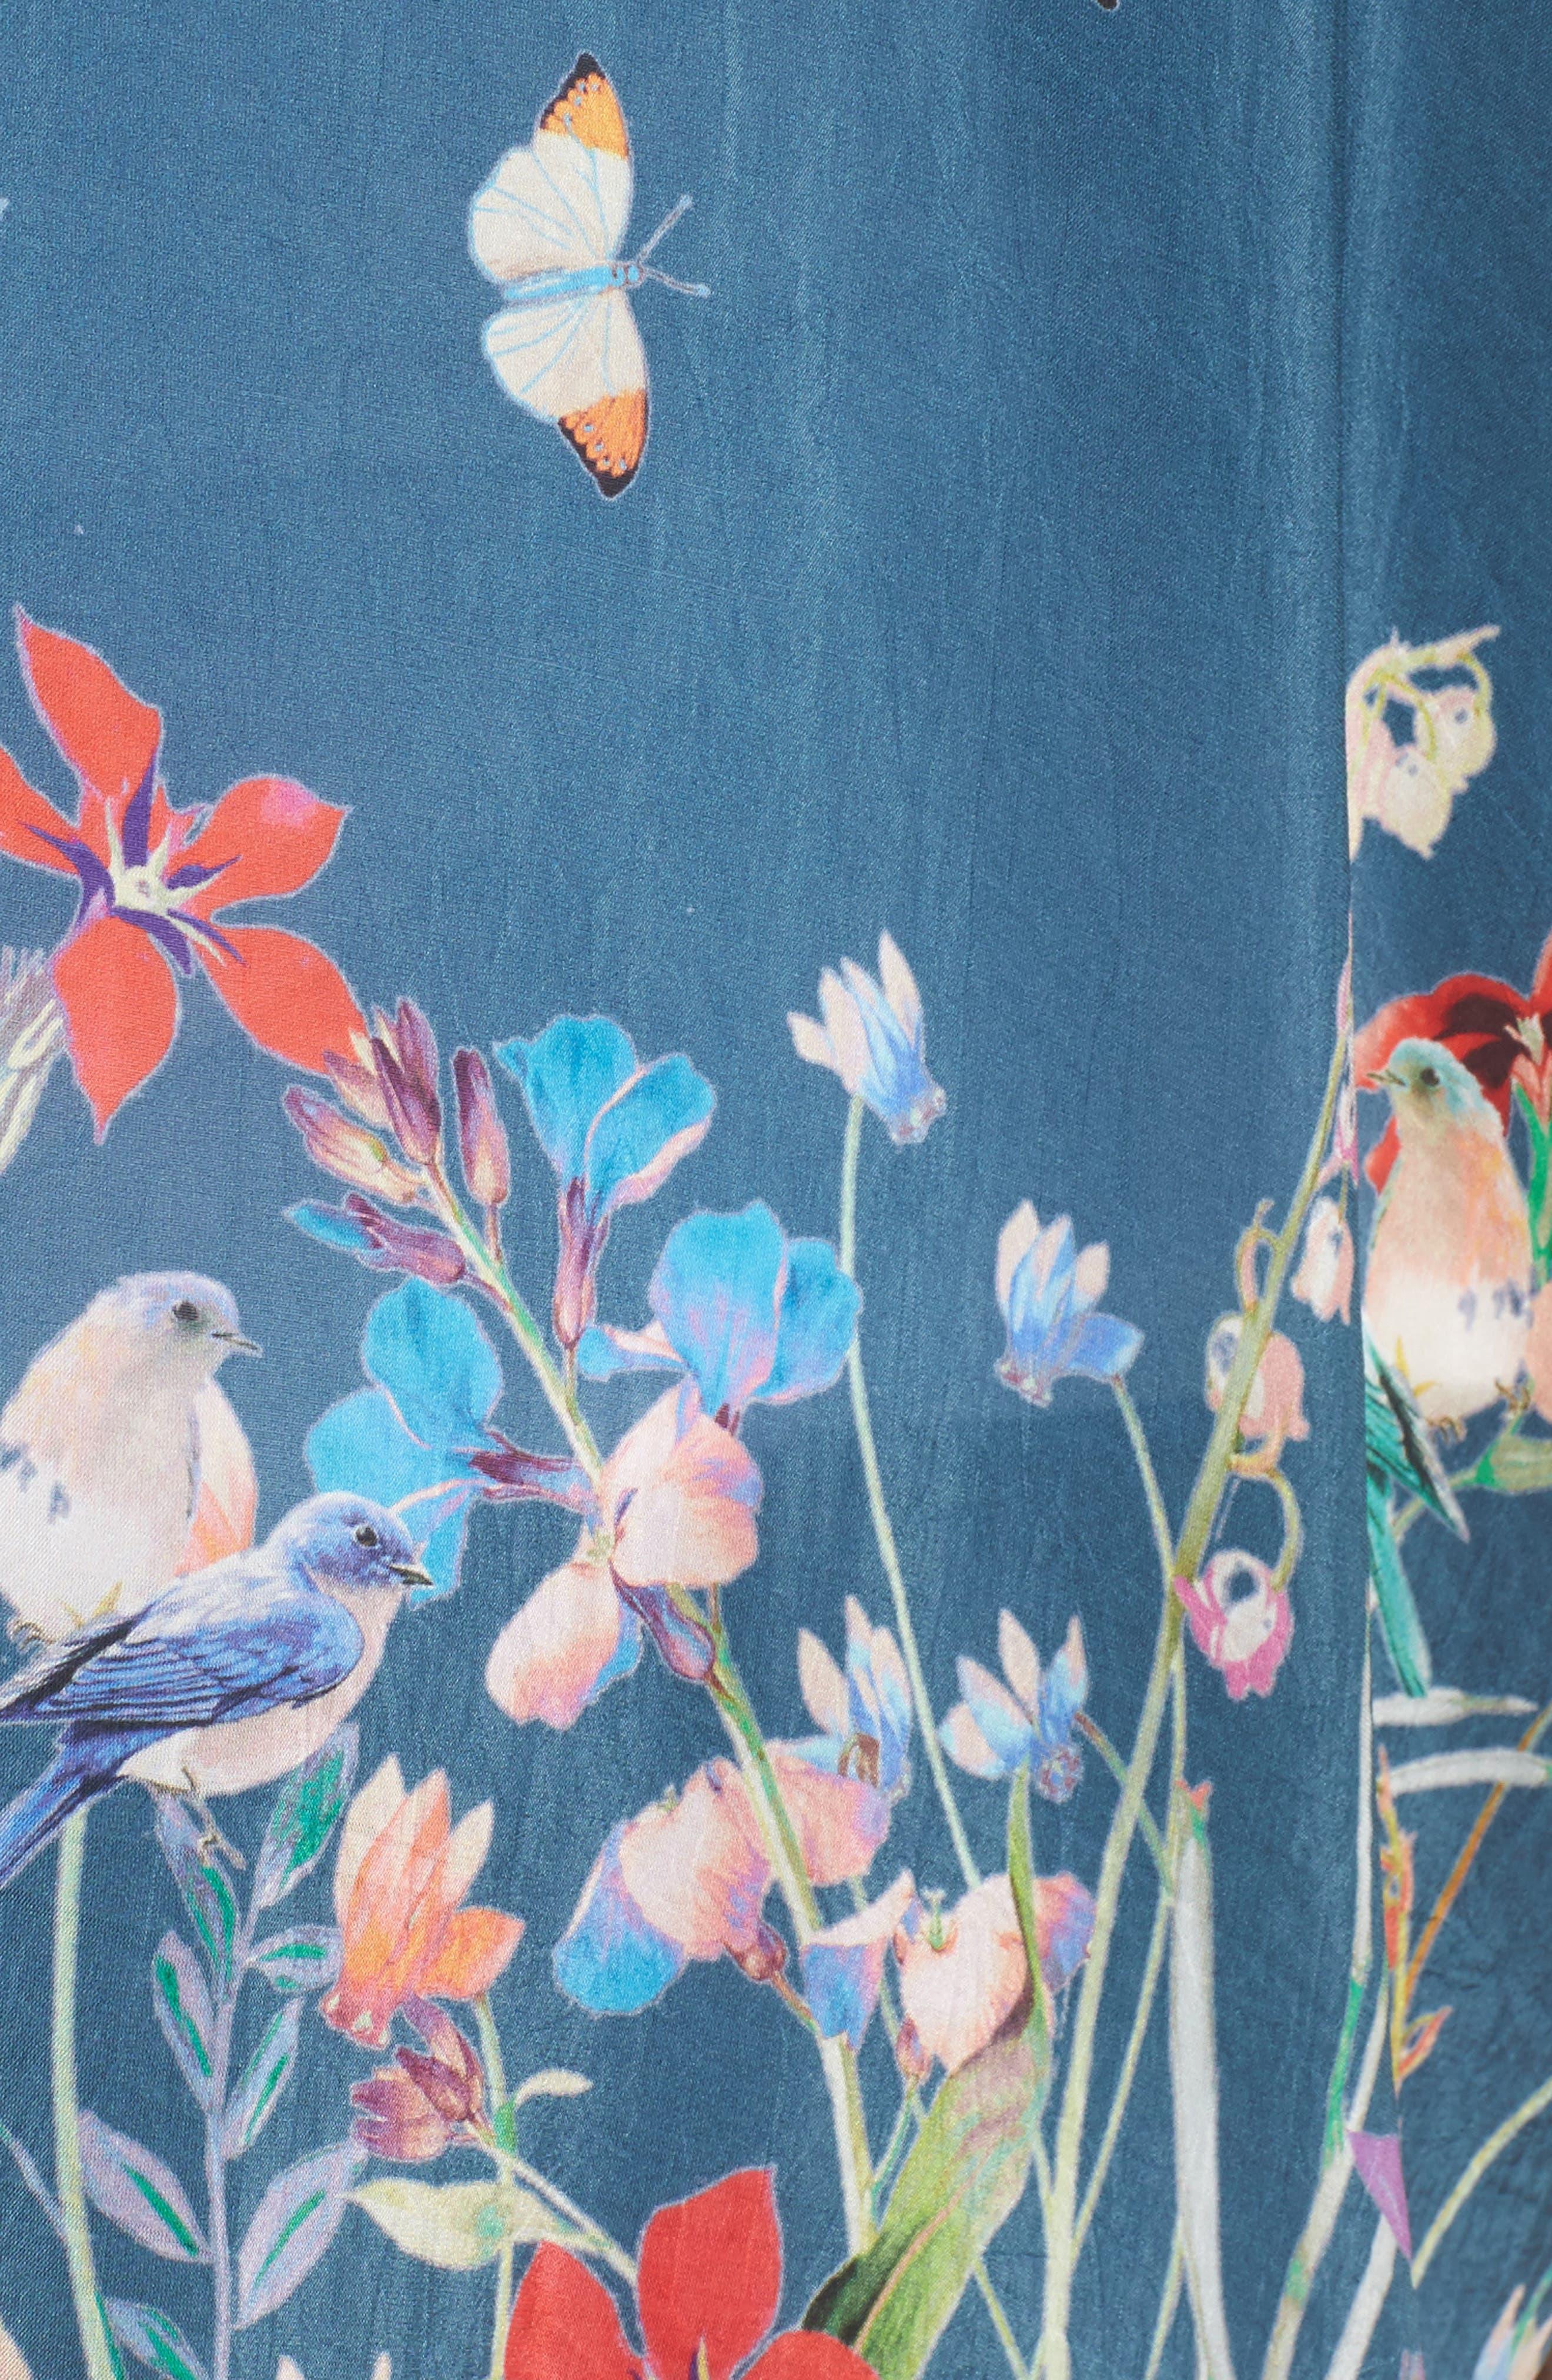 Summer Paisley Silk Kimono,                             Alternate thumbnail 5, color,                             Multi/ Blue